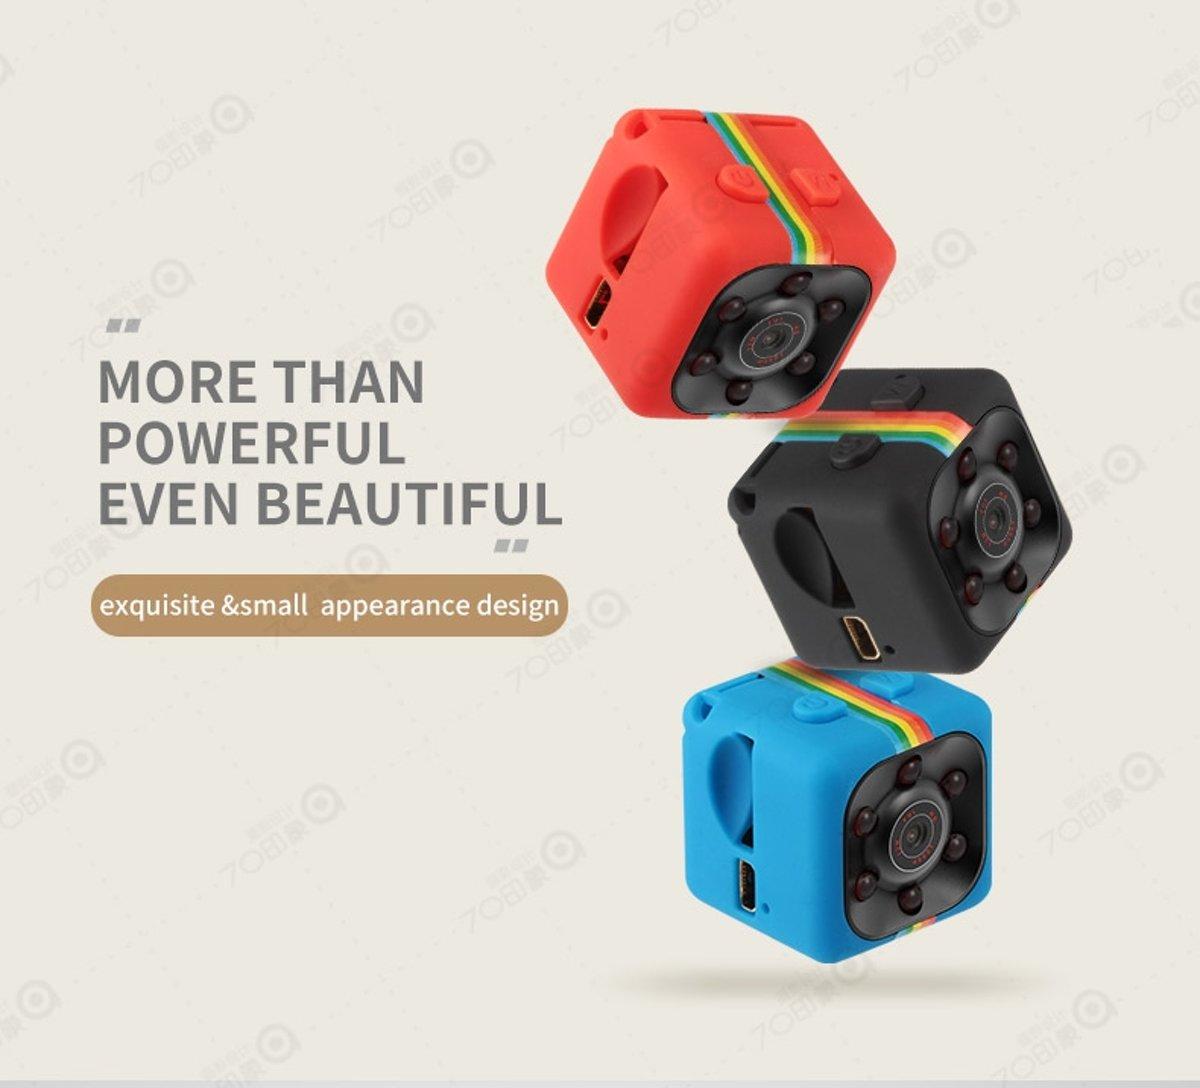 Cenocco Full HD 1080p Mini Camera CC-9047 - Foto's En Video's Van Hoog Kwaliteit